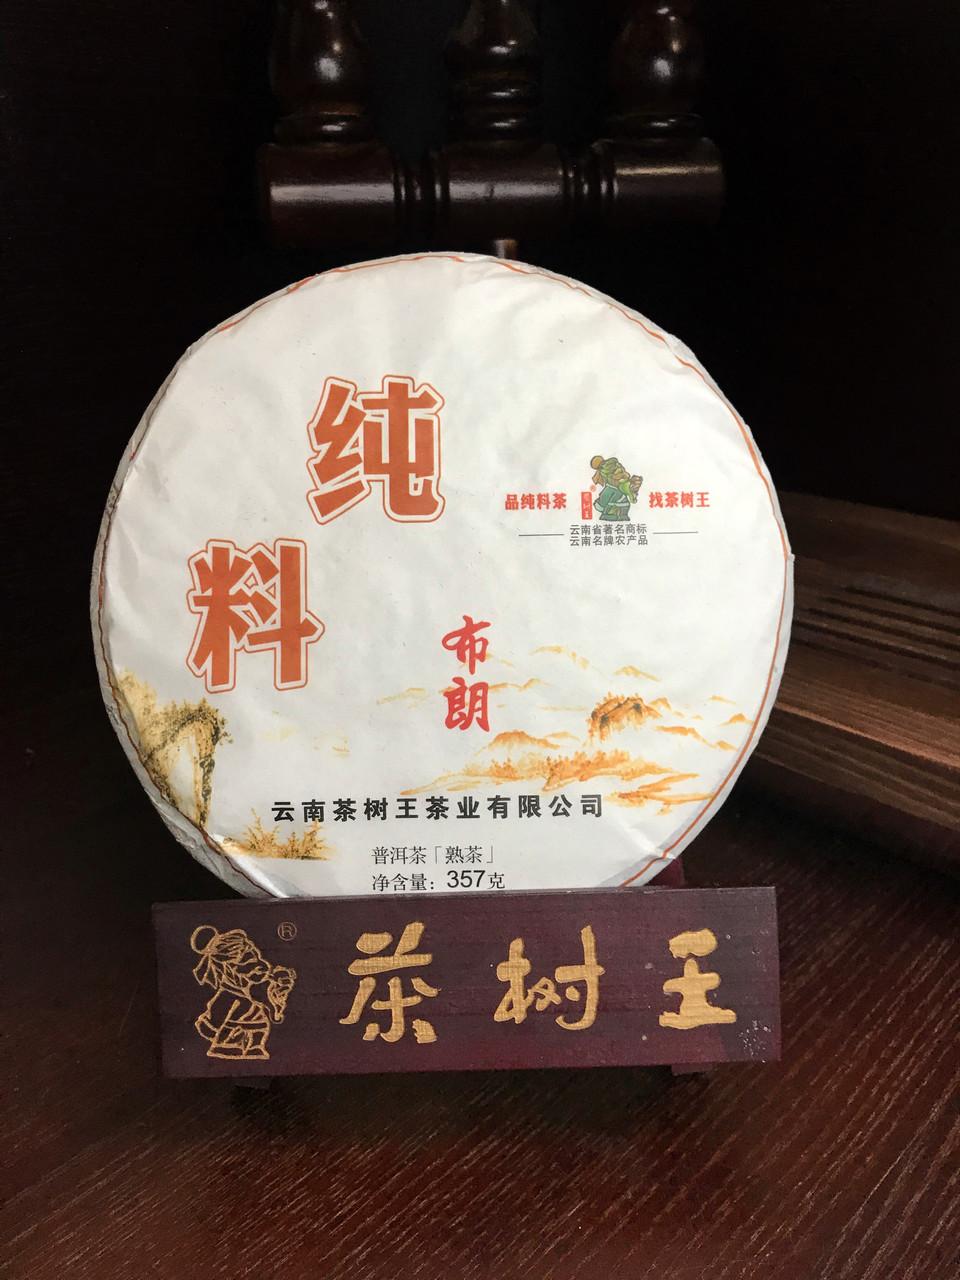 Шу пуэр Бу Лан Шань, фабрика Ча Шу Ван, 2014 год, 357 г